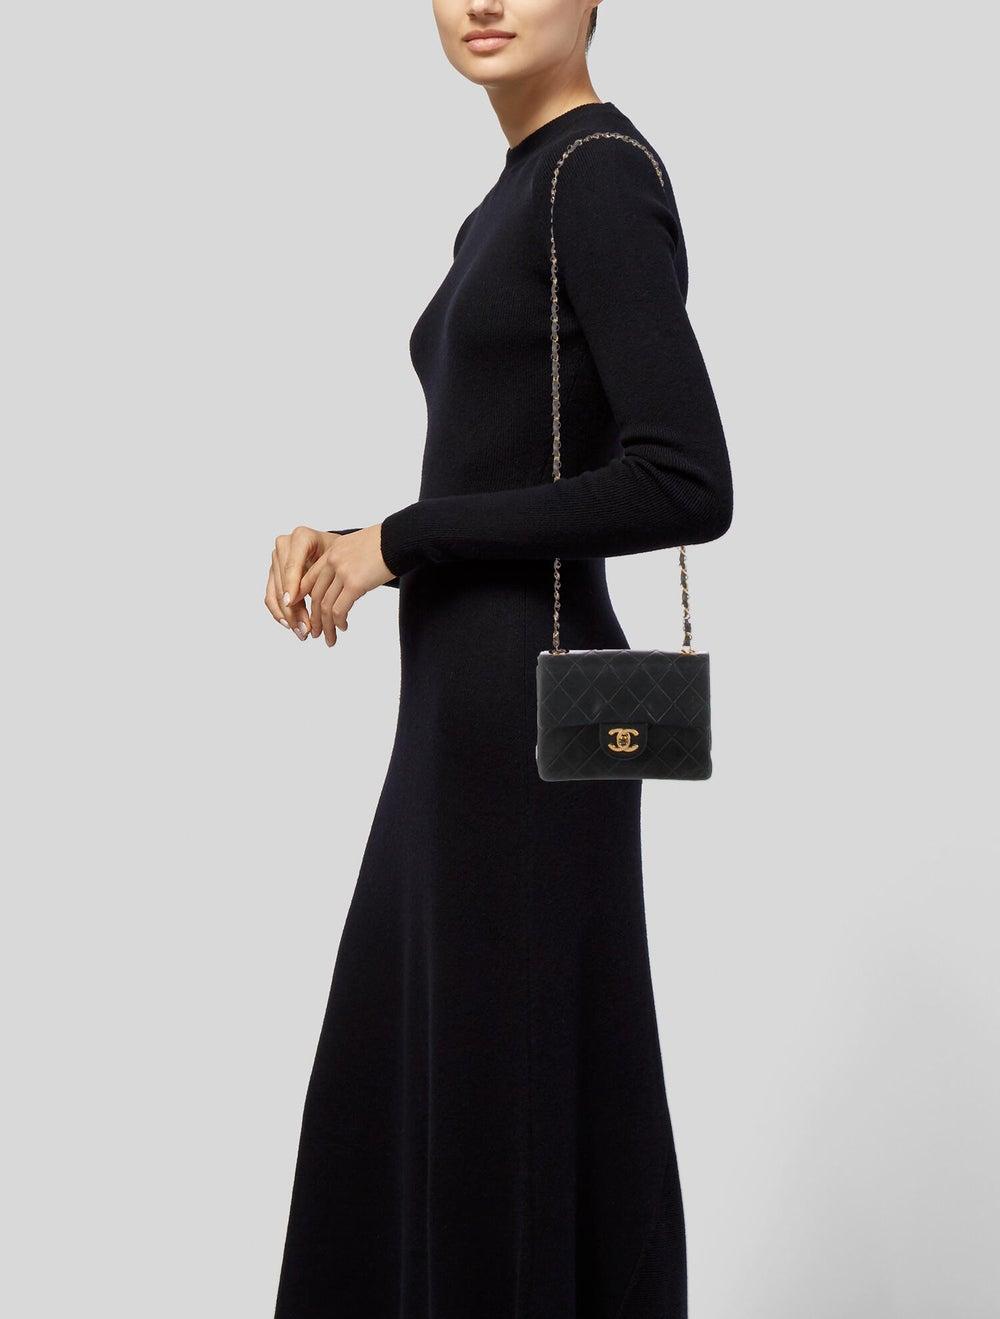 Chanel Vintage Mini Square Flap Bag Blue - image 2